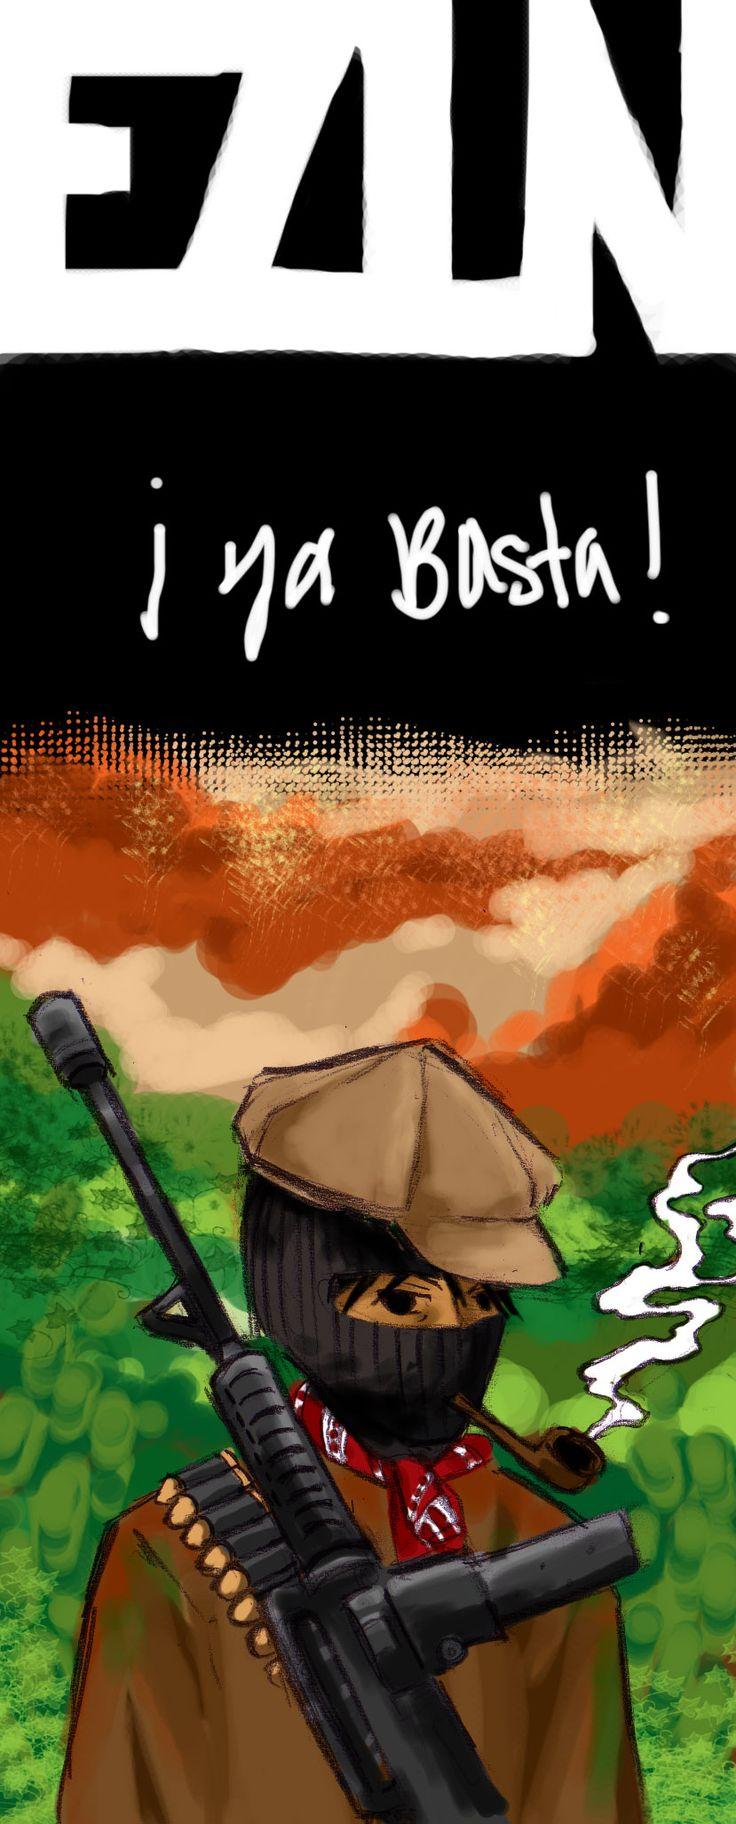 zapatista by minjiminji.deviantart.com on @deviantART